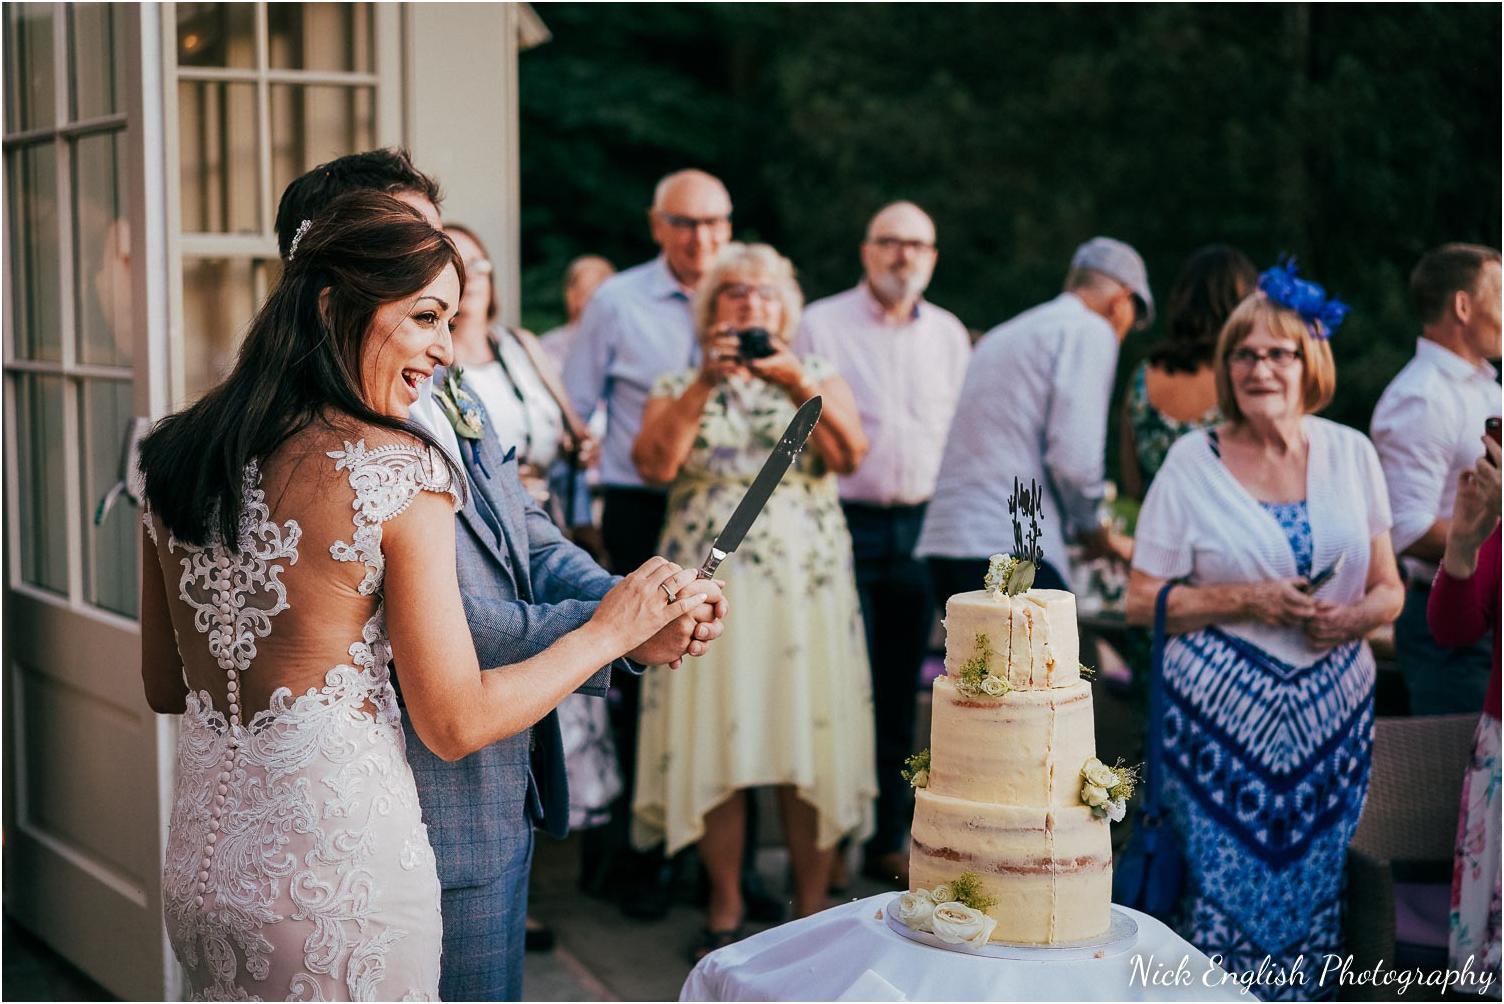 Mitton_Hall_Wedding_Photographer-131.jpg